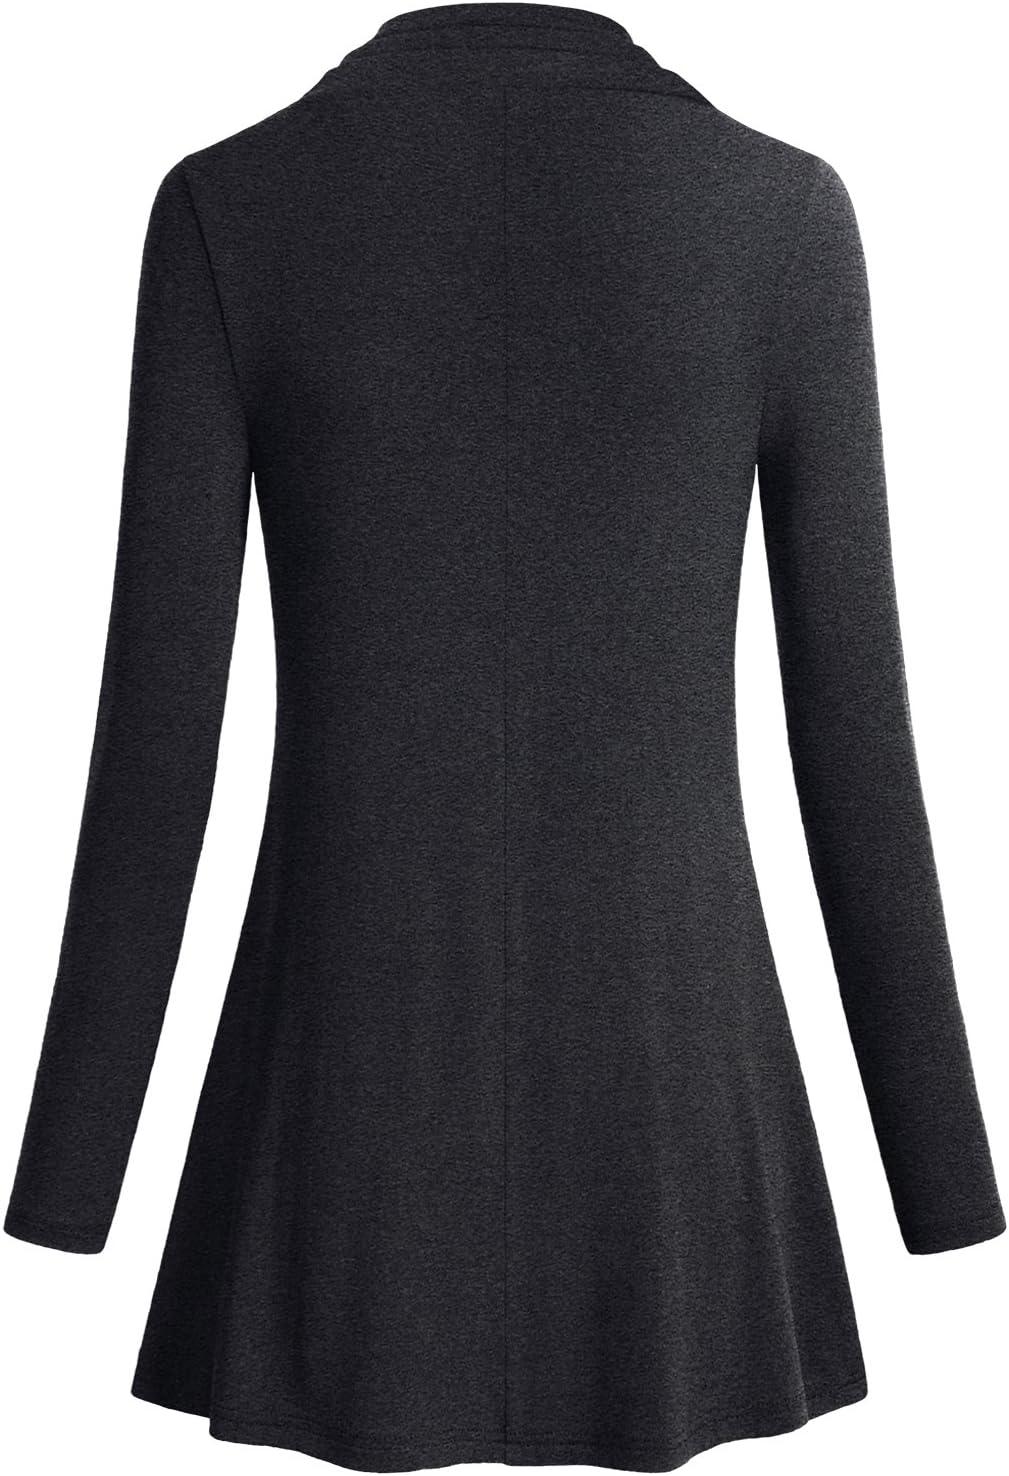 Miusey Plus Size Womens Long Sleeve Christmas Shirt For Leggings Gift Tunic